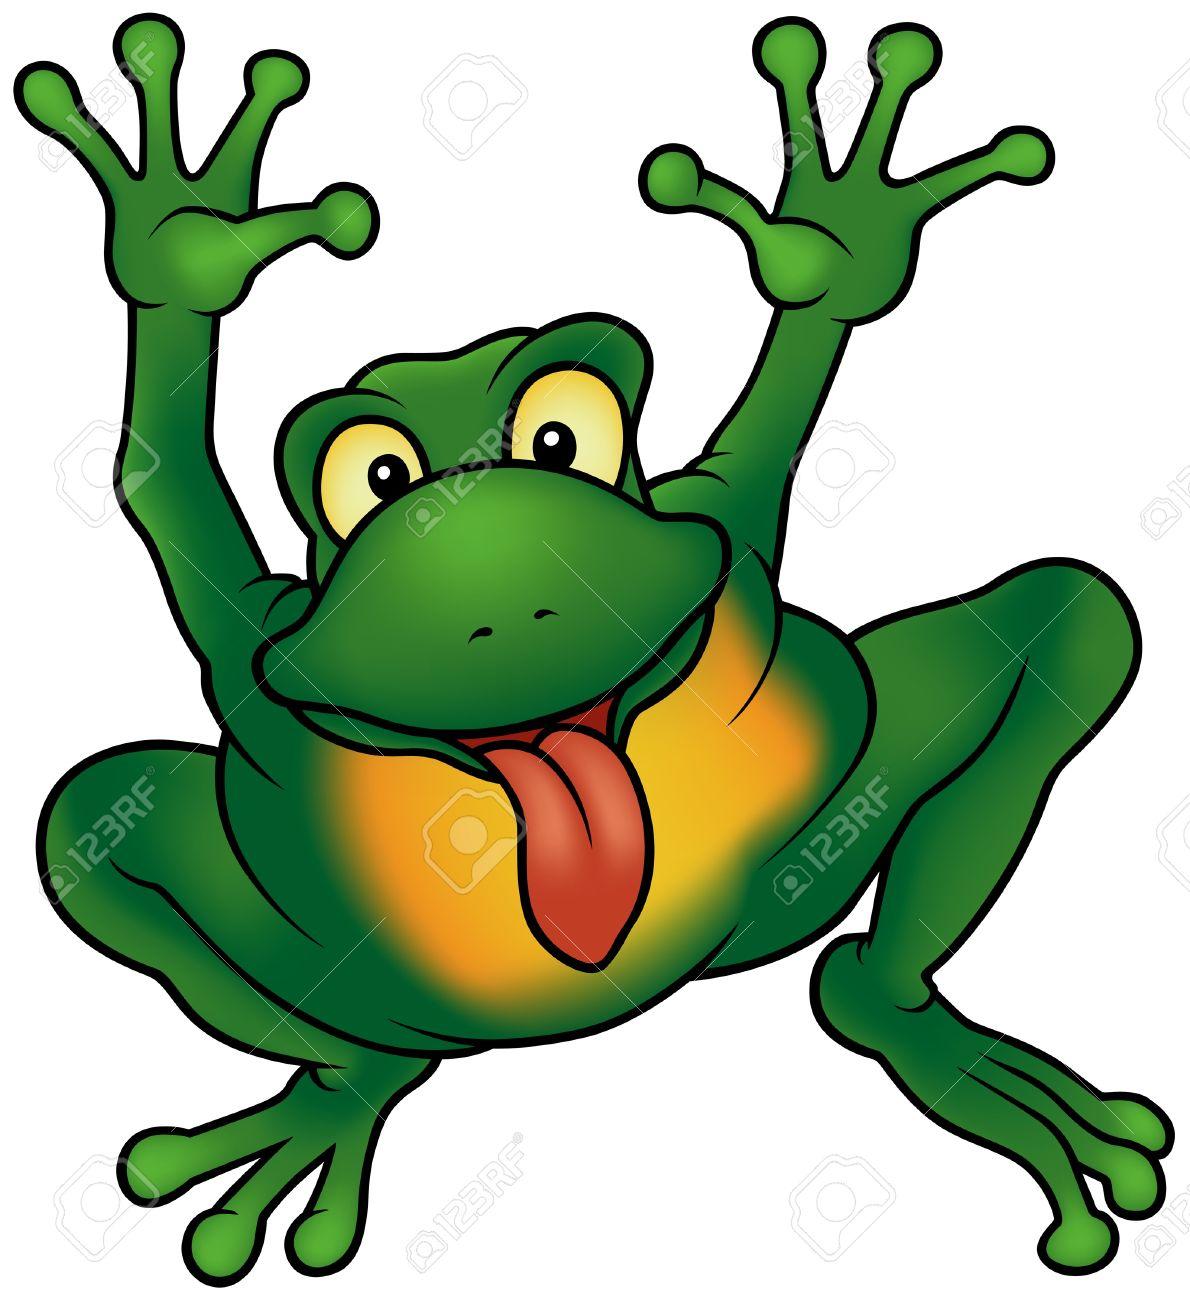 happy frog cartoon illustration detailed royalty free cliparts